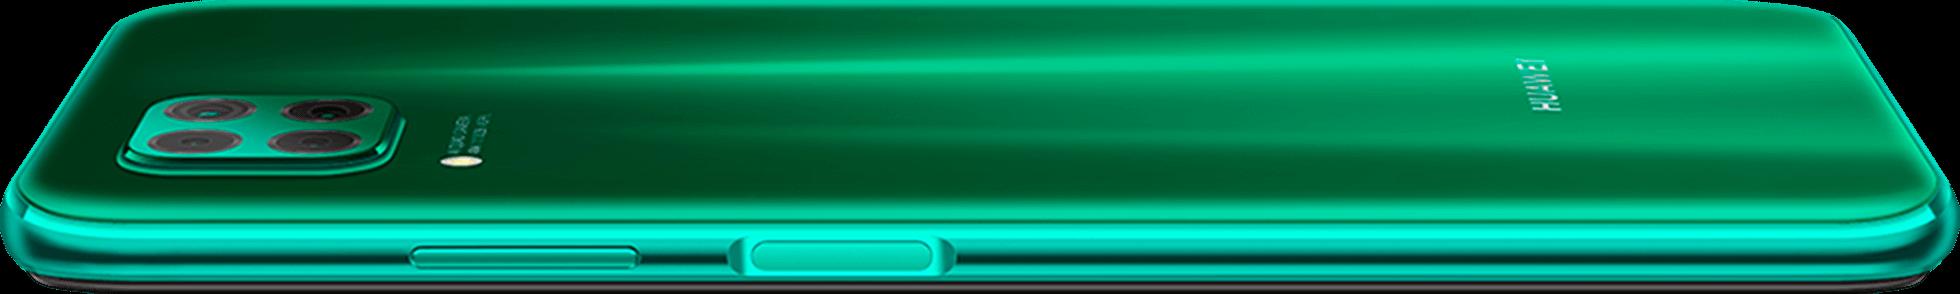 Huawei P40 Lite: Review y  Características